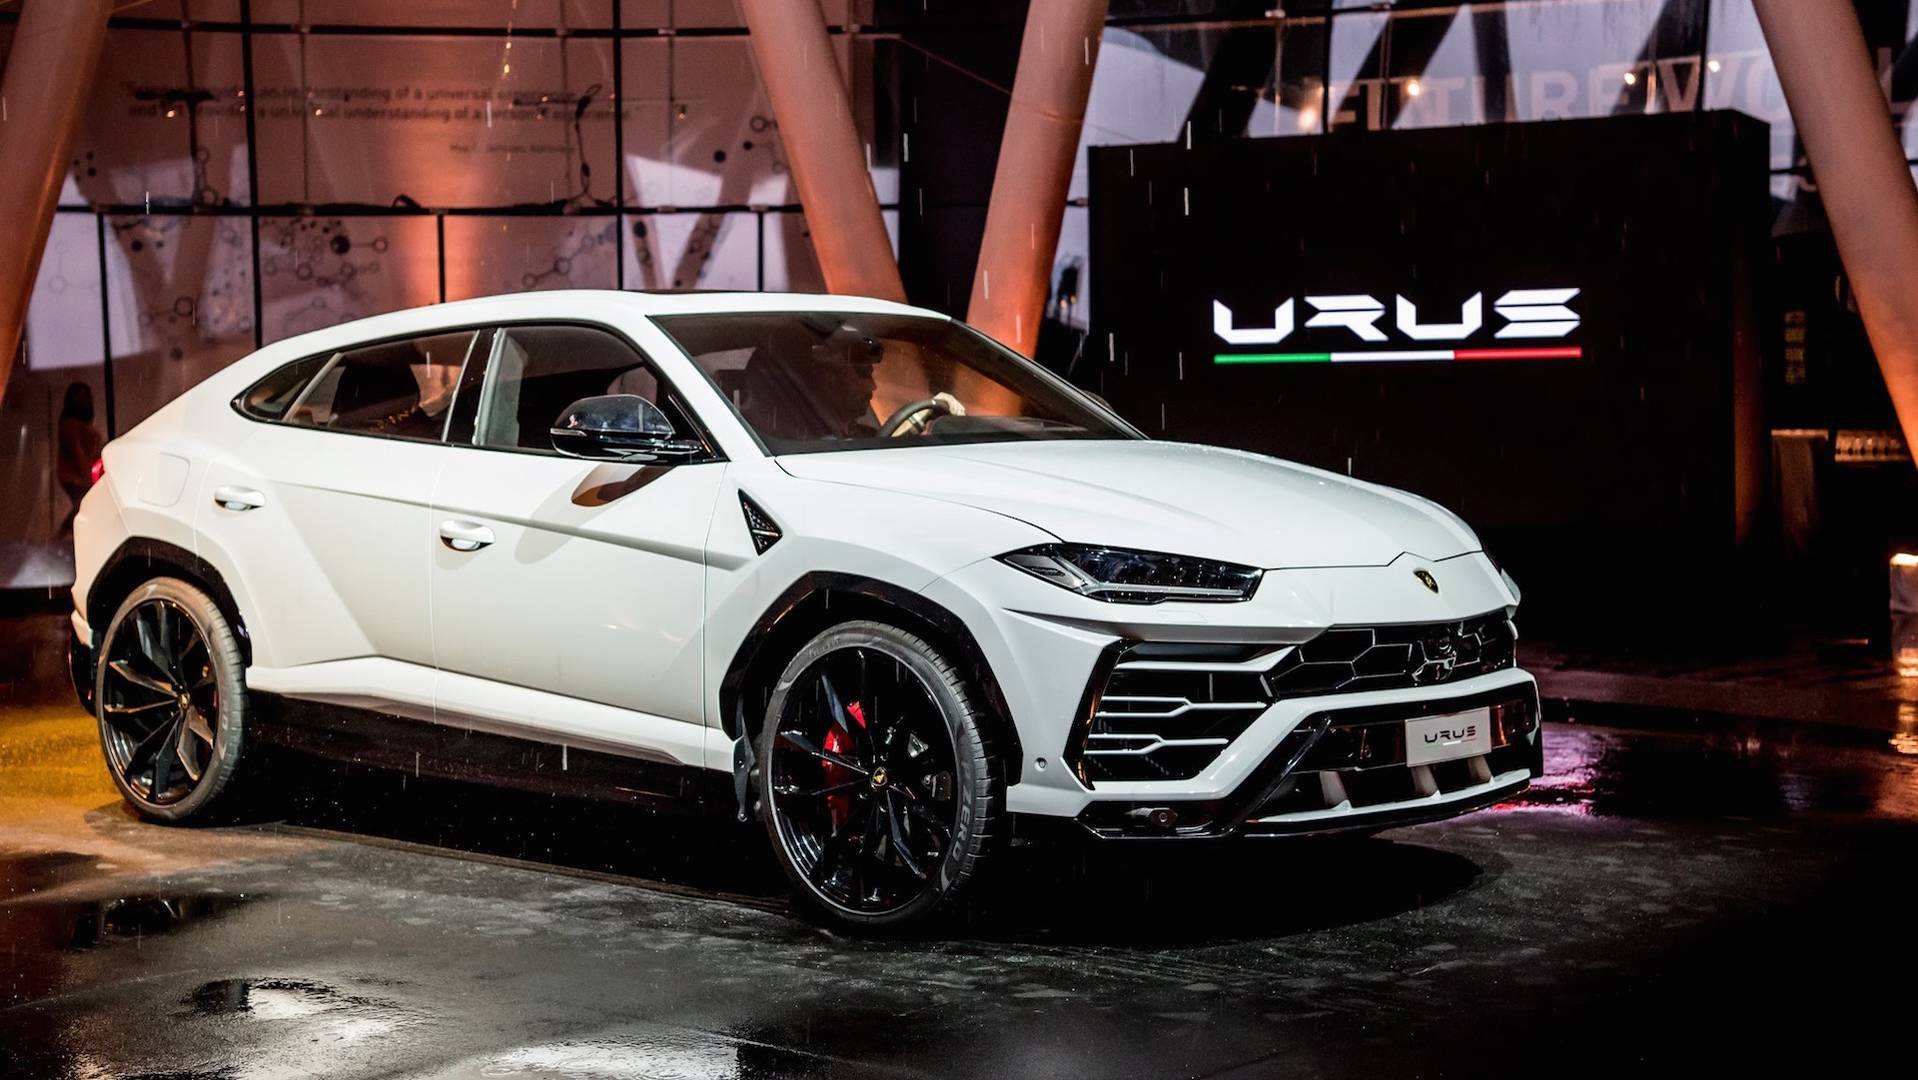 Lamborghini Shows New Urus In The Sheet Metal In Singapore